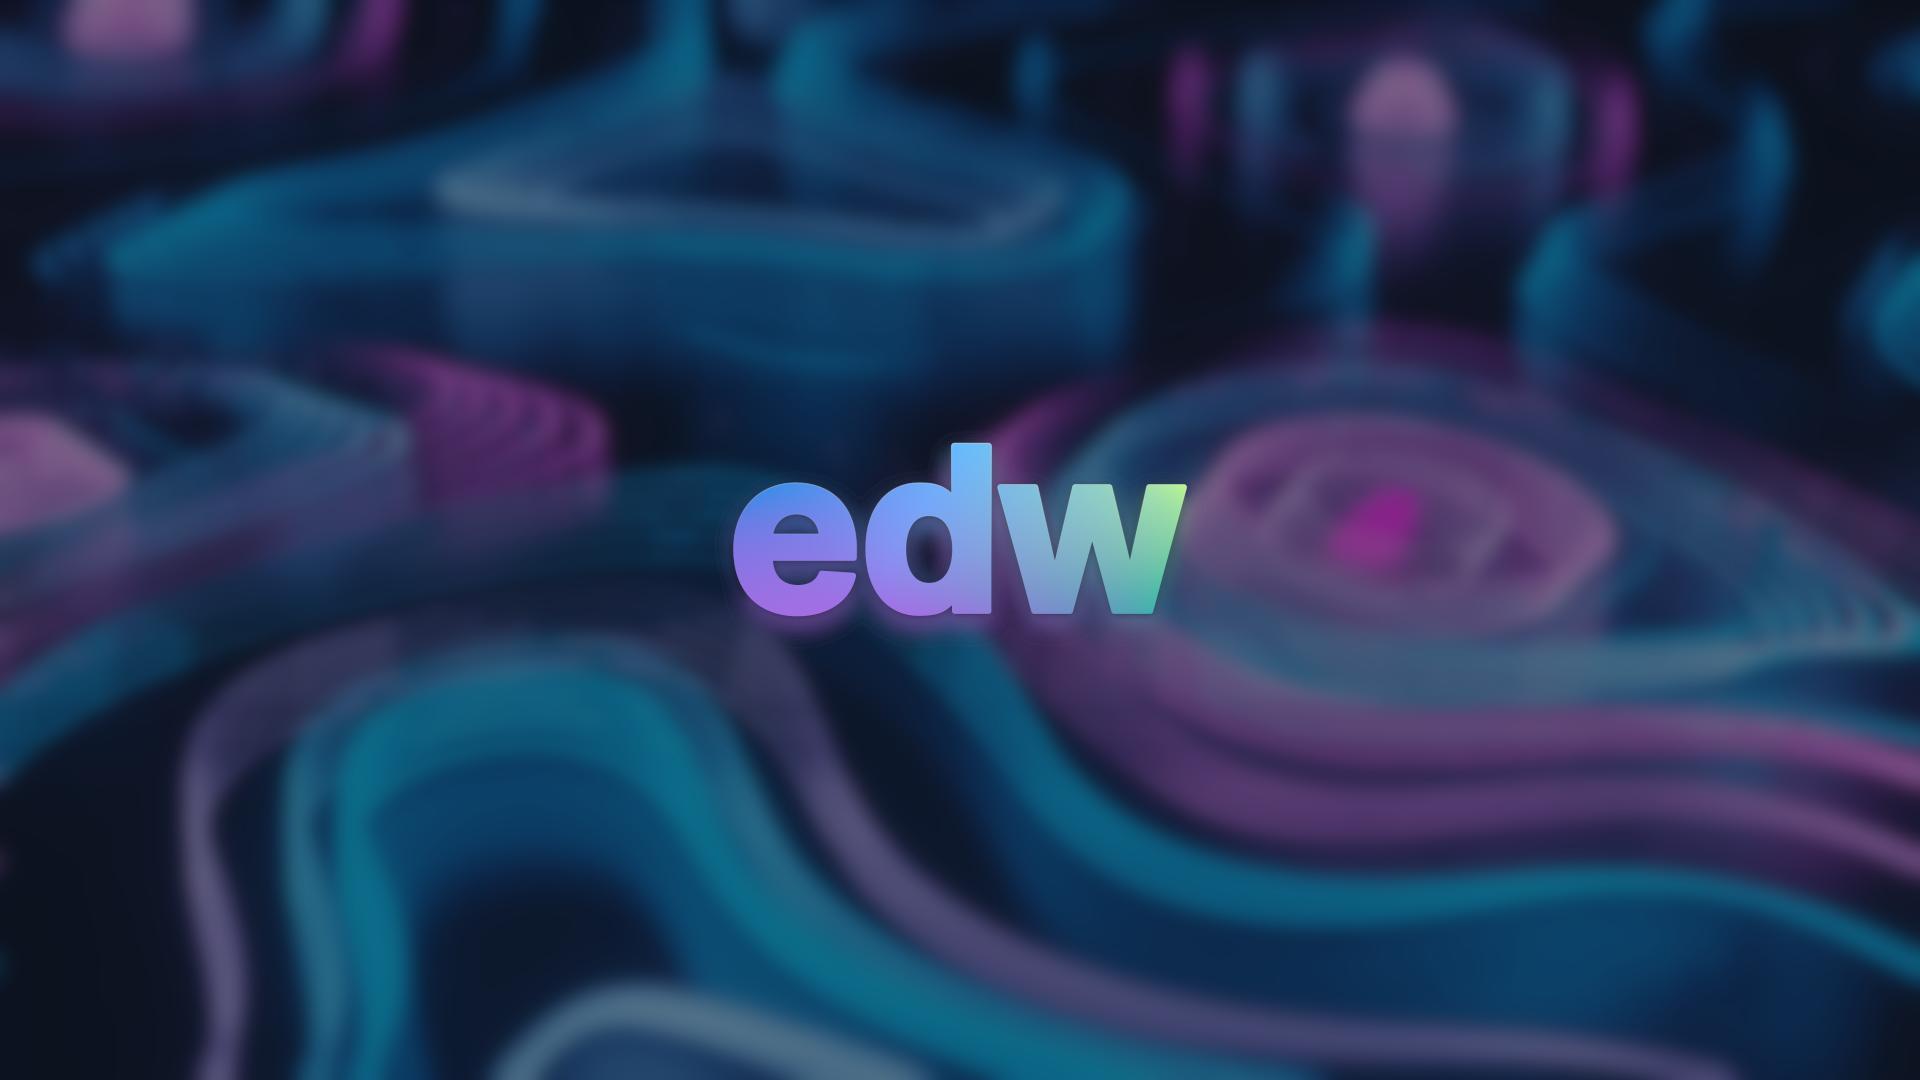 edw.elementary.io